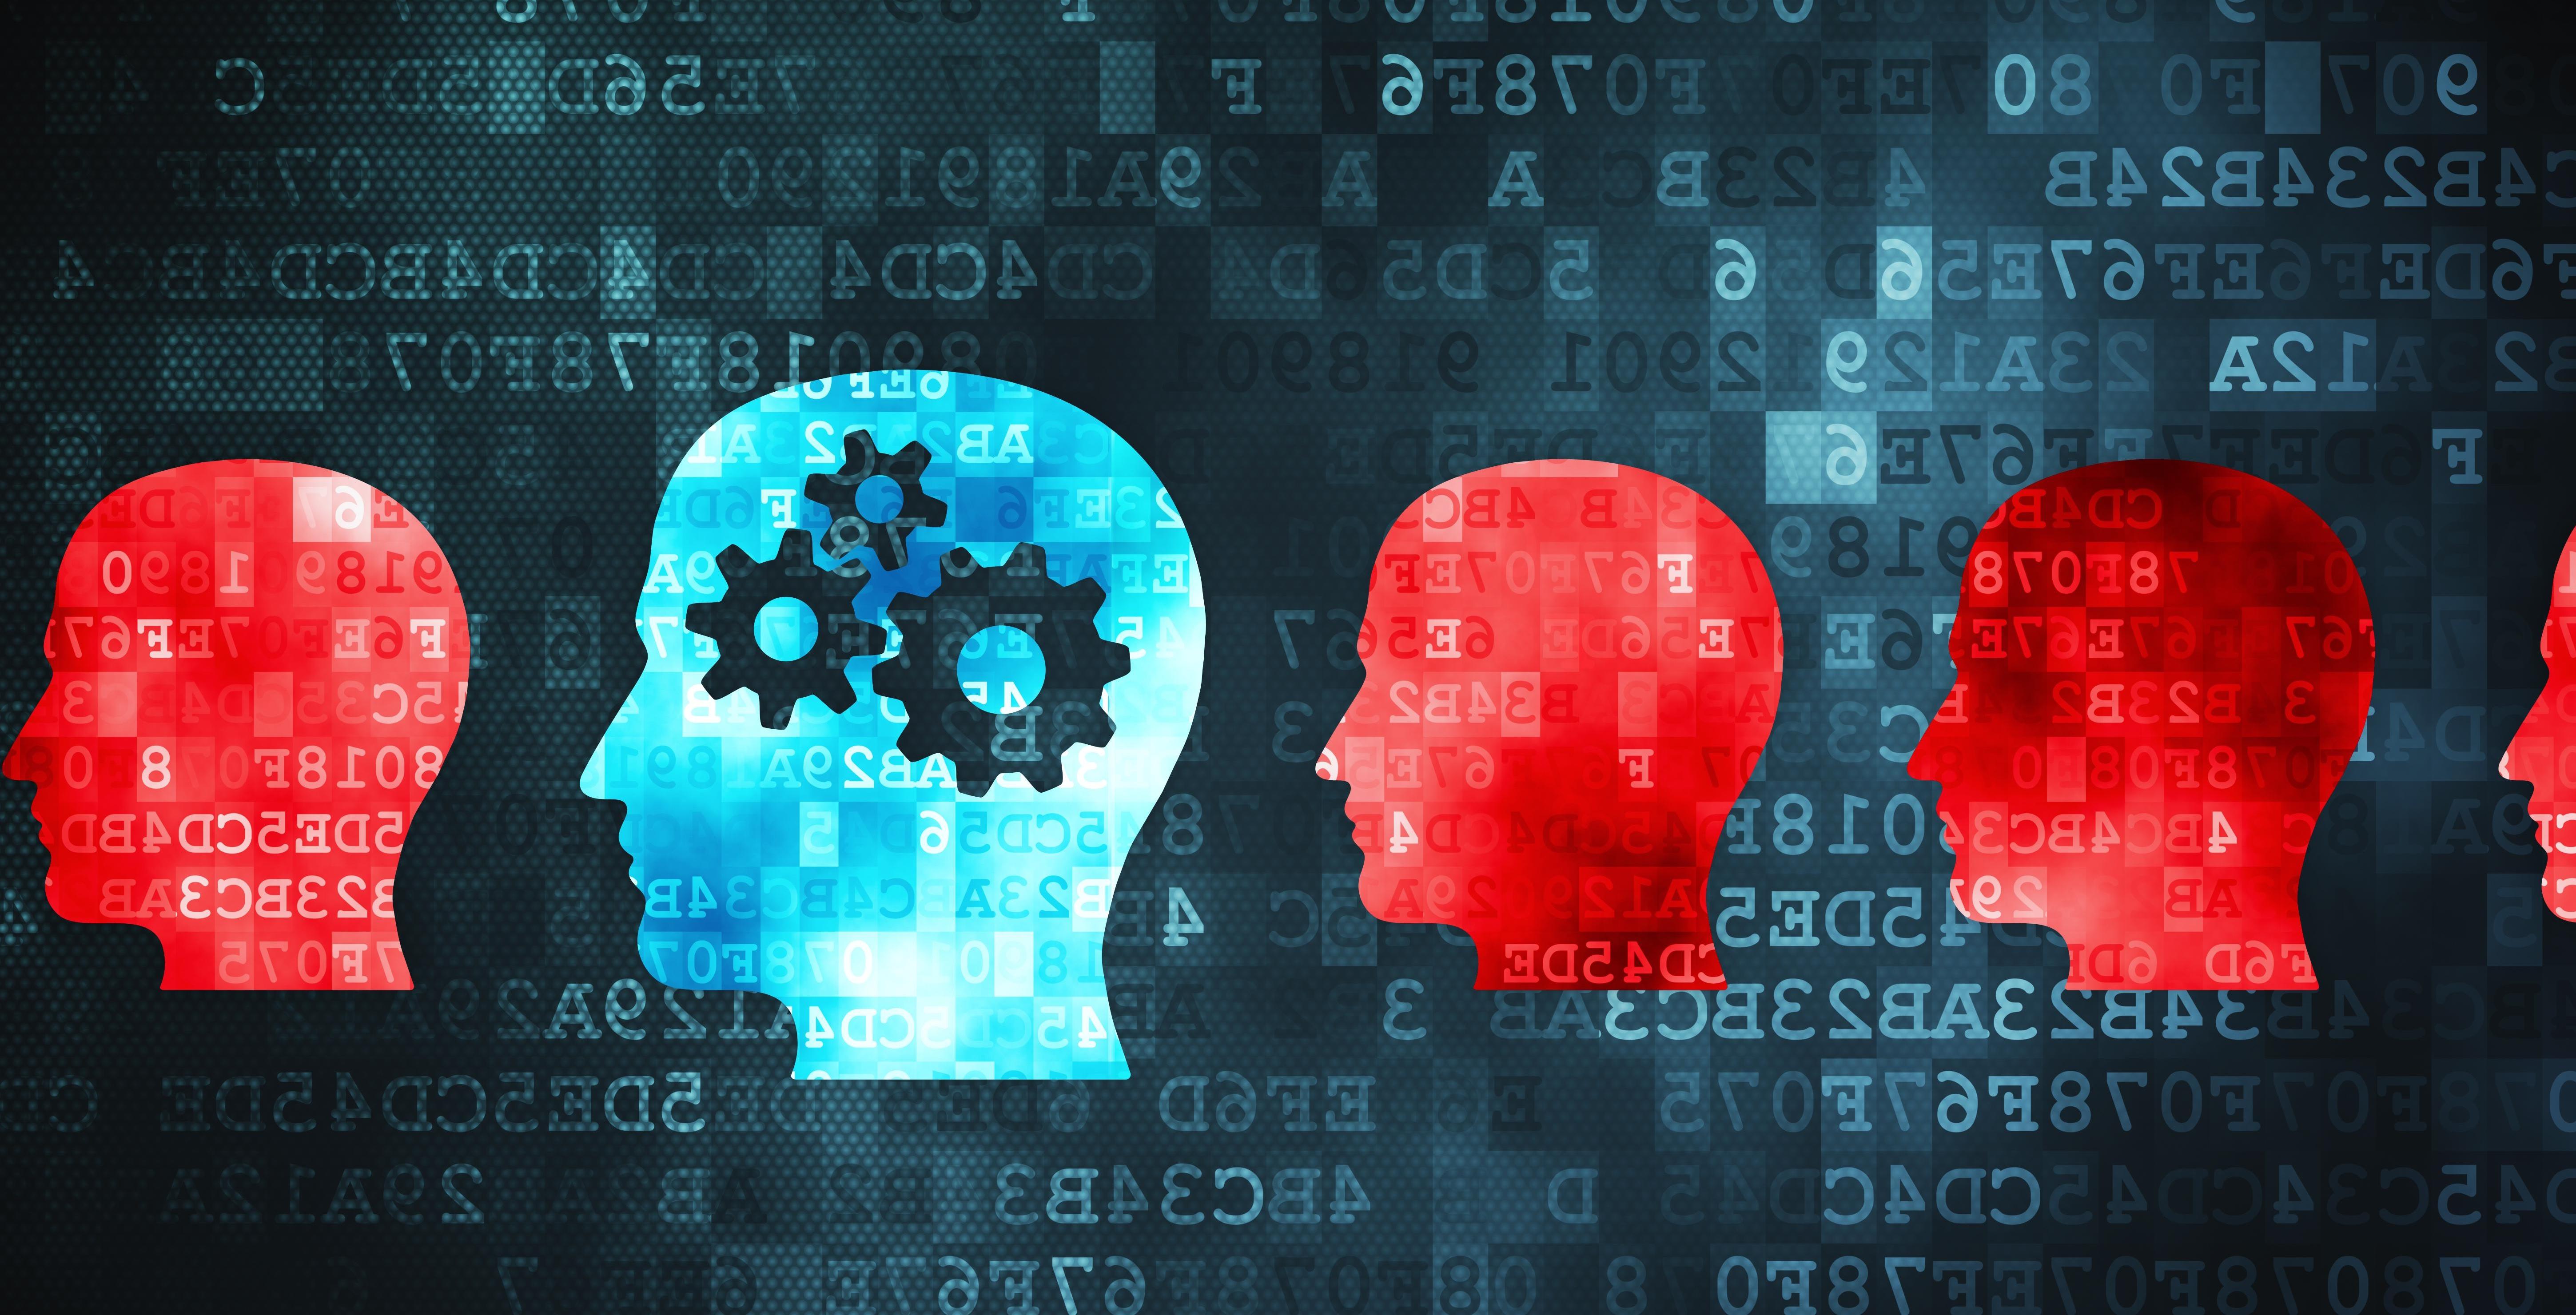 40 Daily Brain Training Exercises, Activities For Intelligene